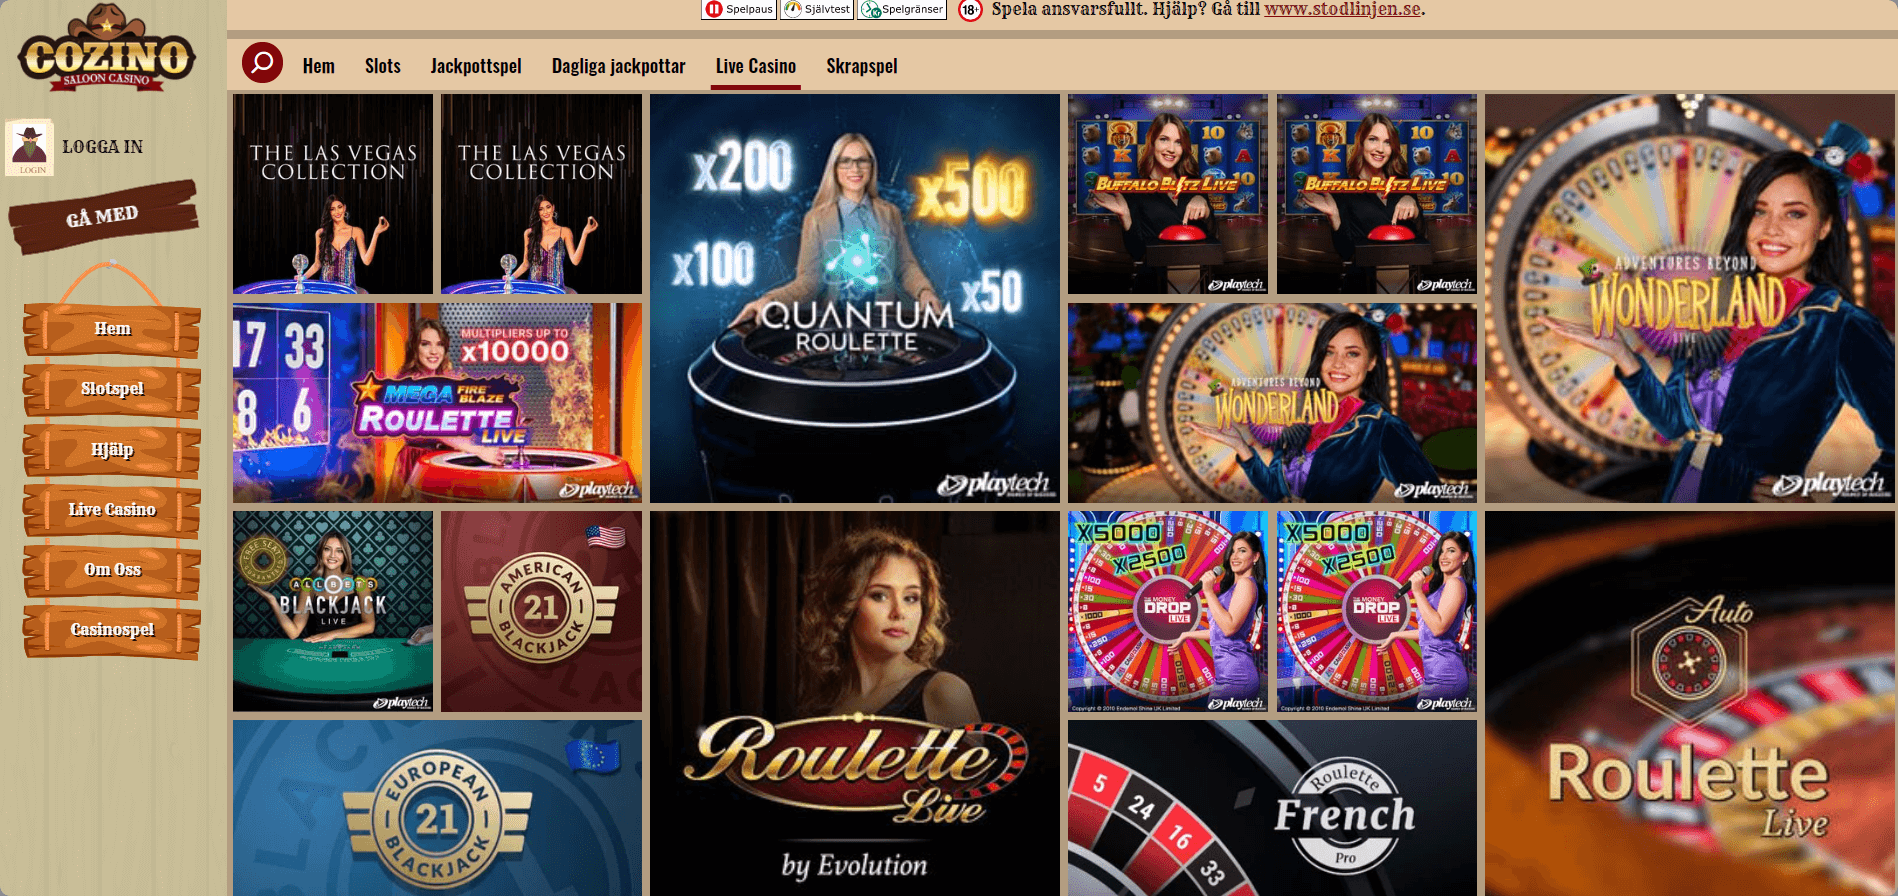 Cozino casino Live casino